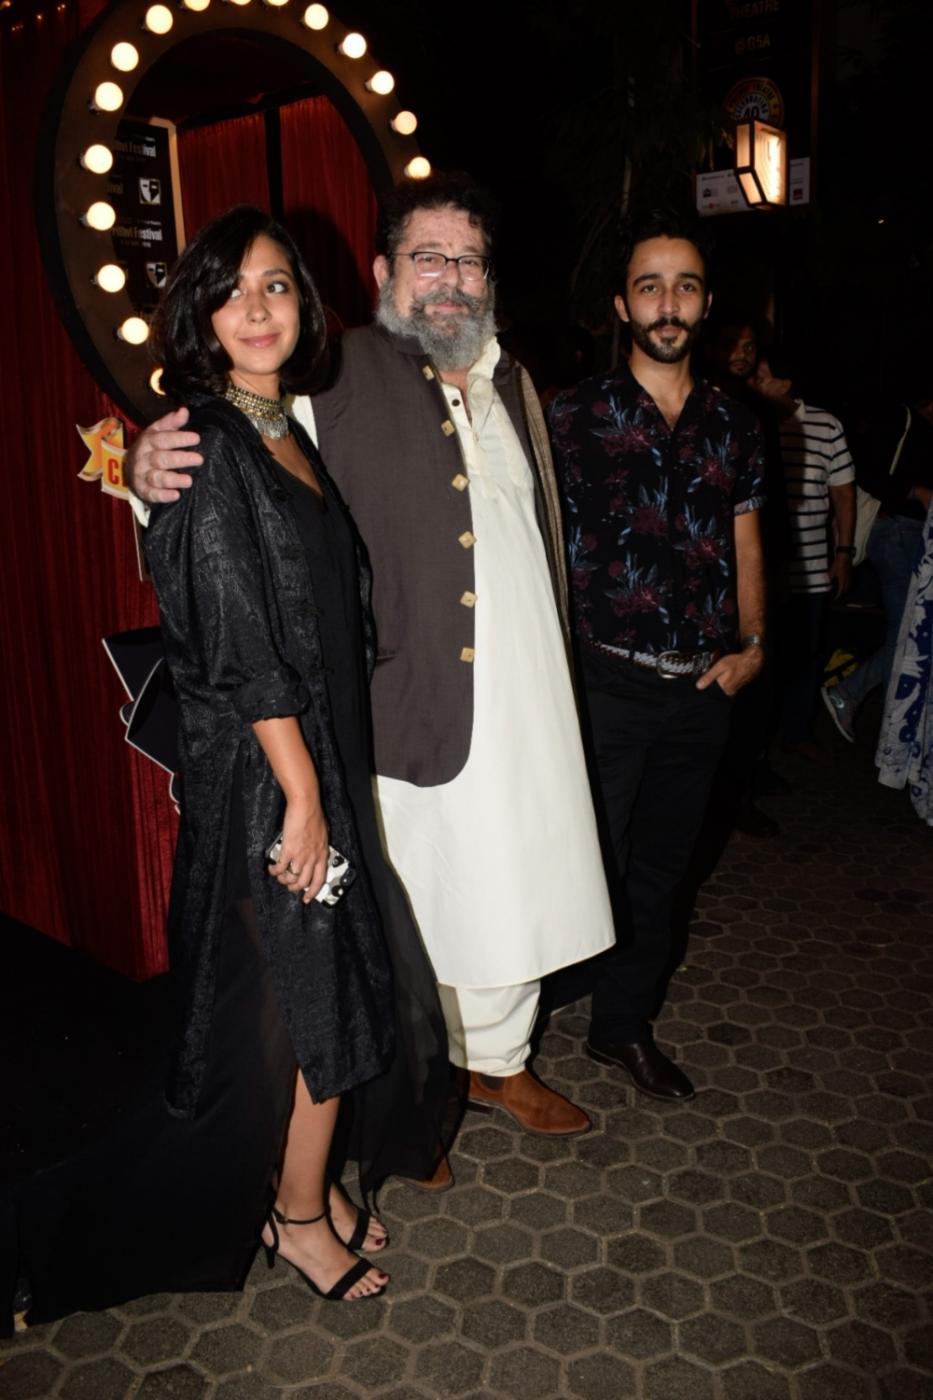 Mumbai: Filmmaker Hansal Mehta at the 40th anniversary celebration of the Prithvi Theatre in Mumbai on Nov 5, 2018. (Photo: IANS) by .